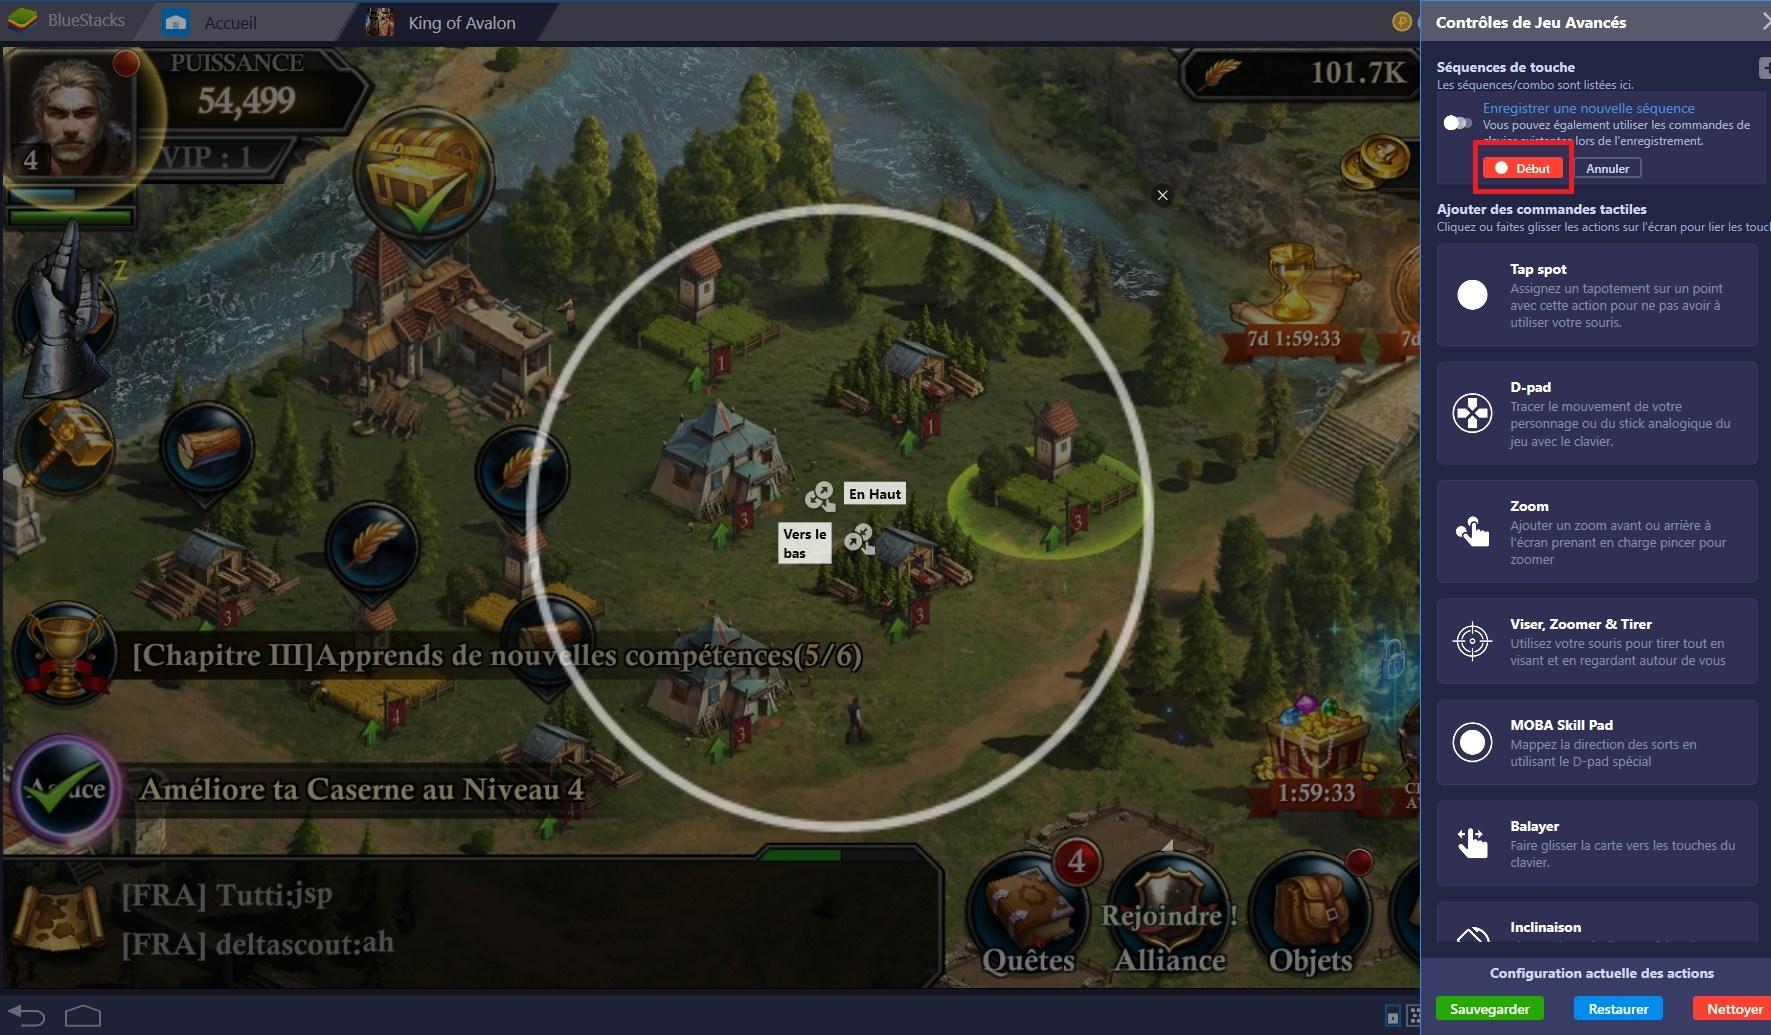 King of Avalon : Optimiser son expérience de jeu grâce au Combo Key de BlueStacks